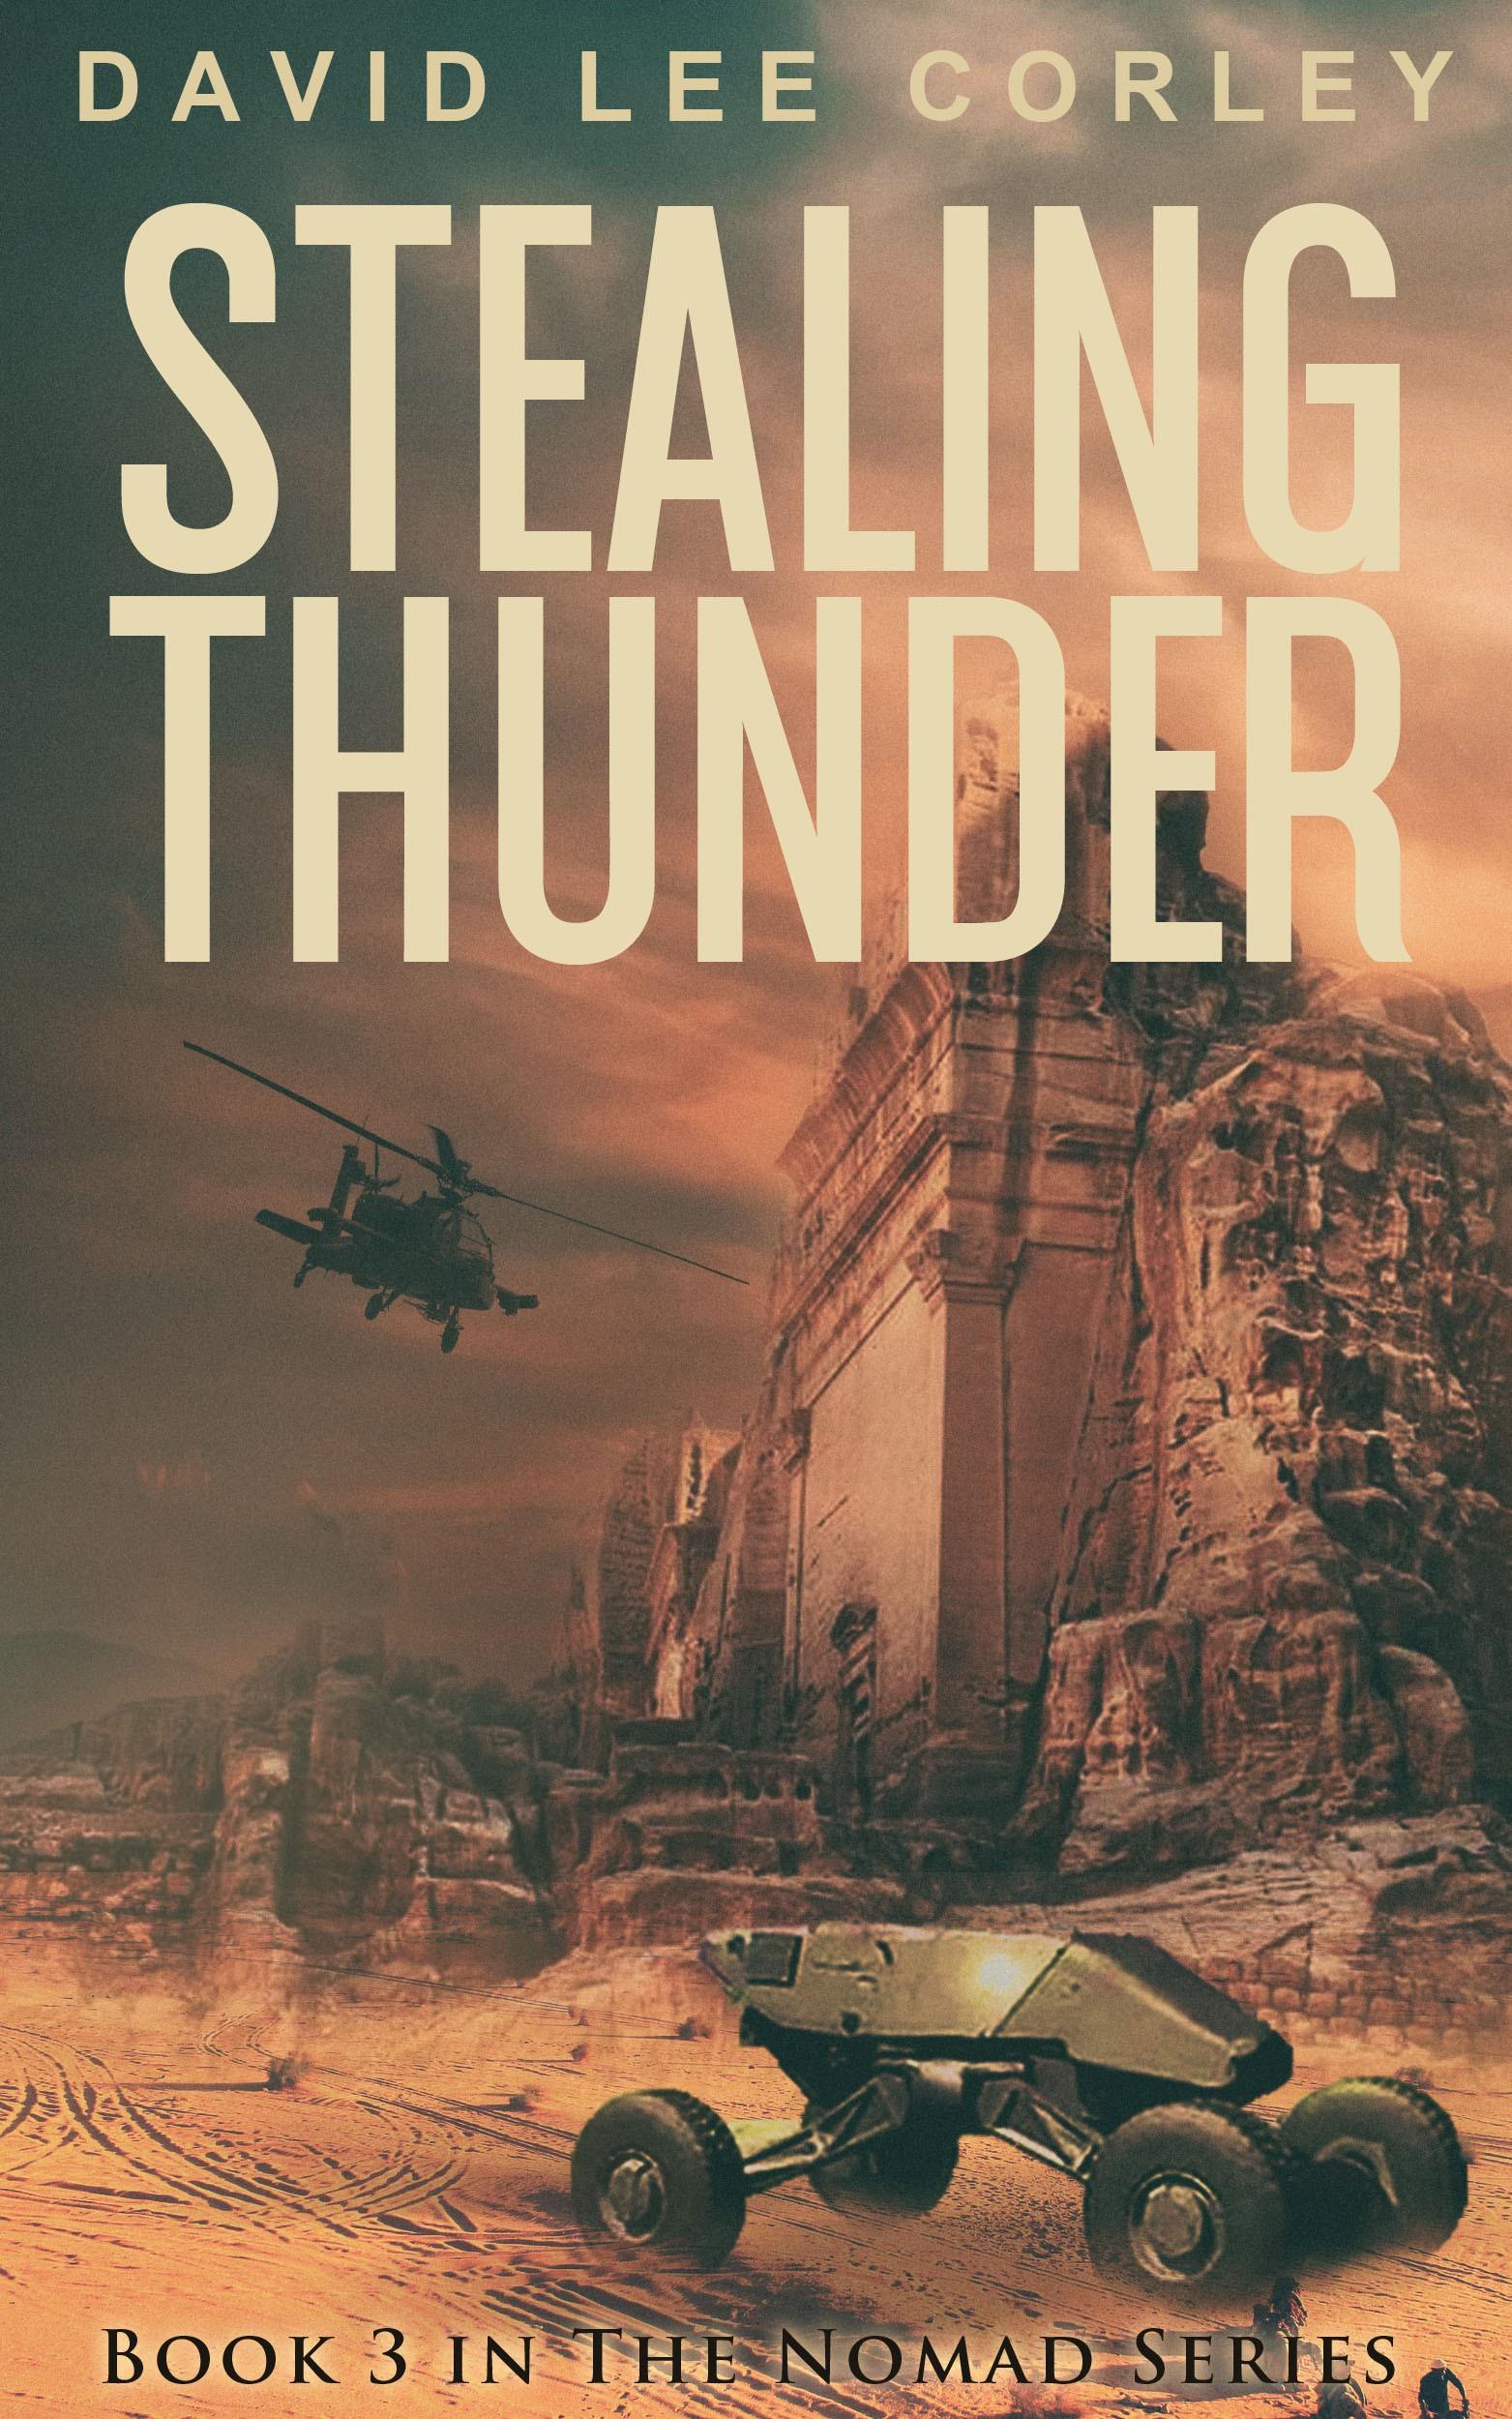 Military Tech Novel Needs Killer Book Cover